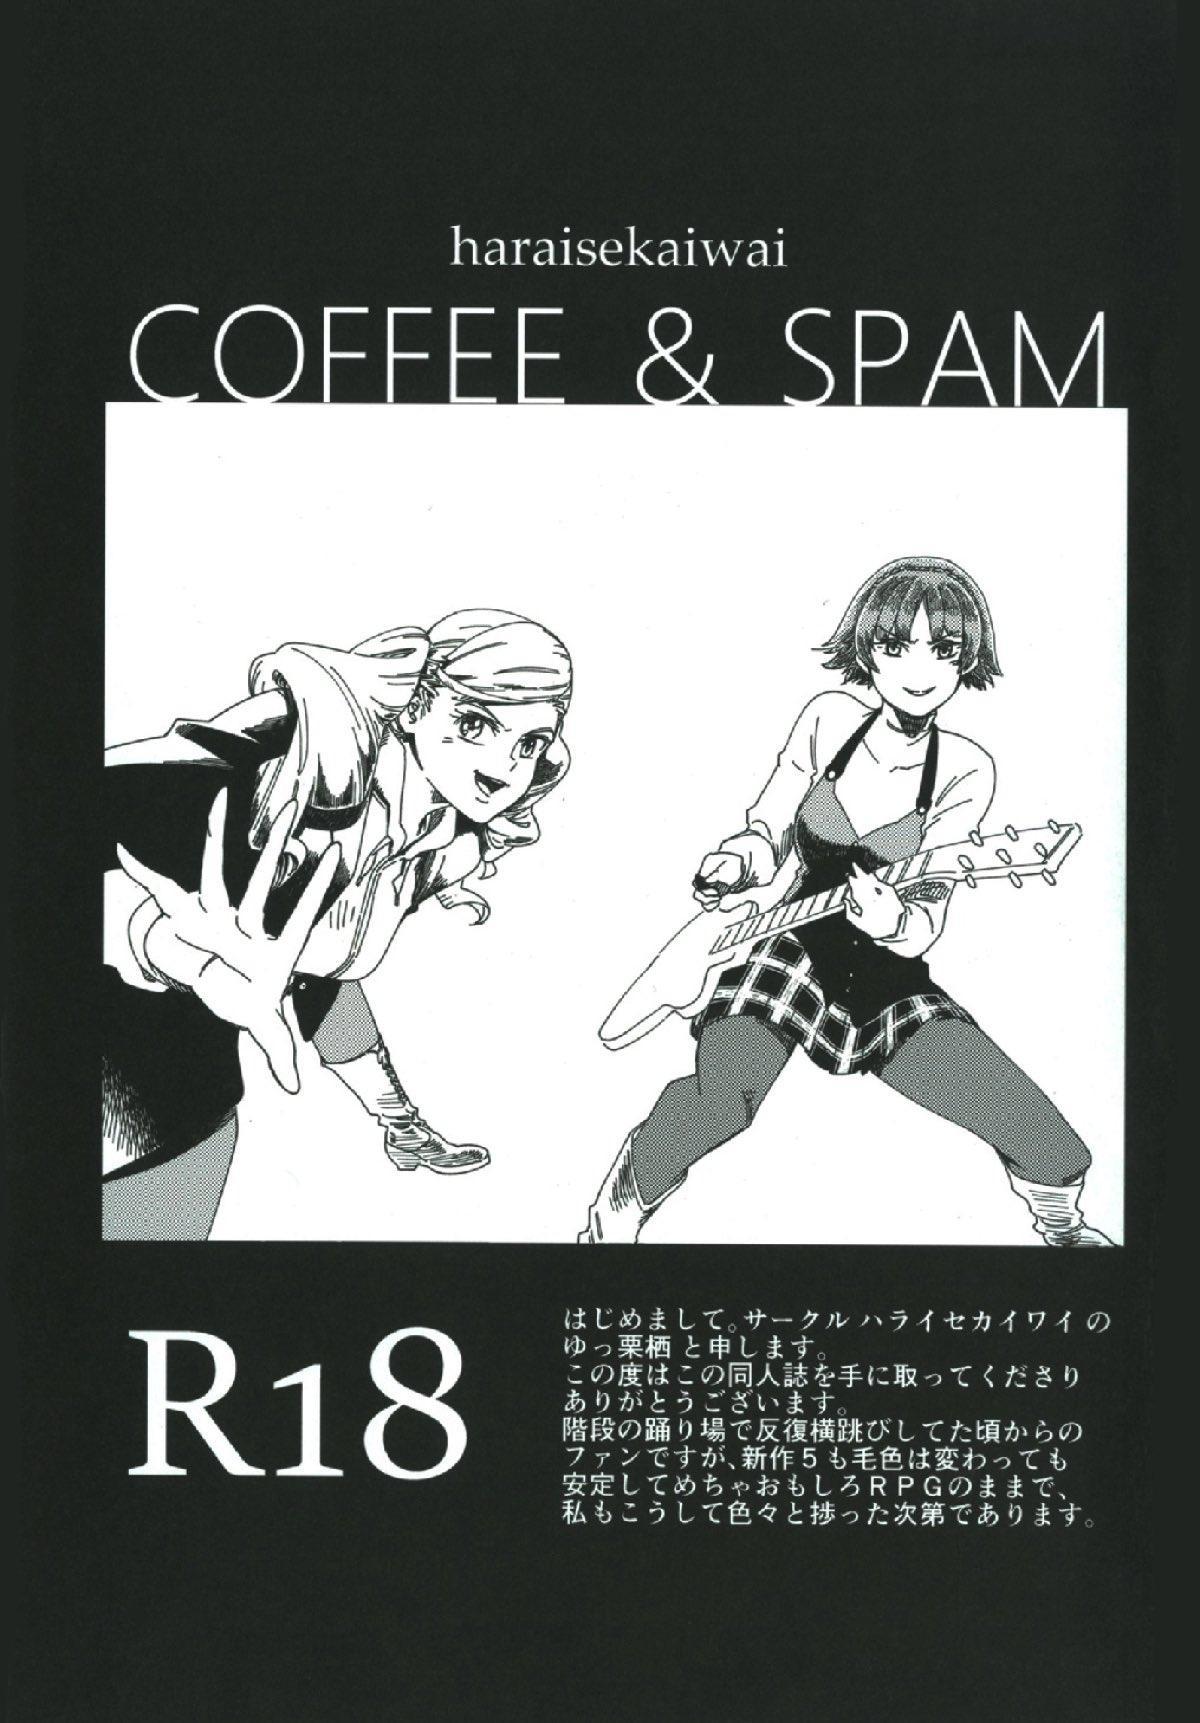 COFFEE & SPAM 1